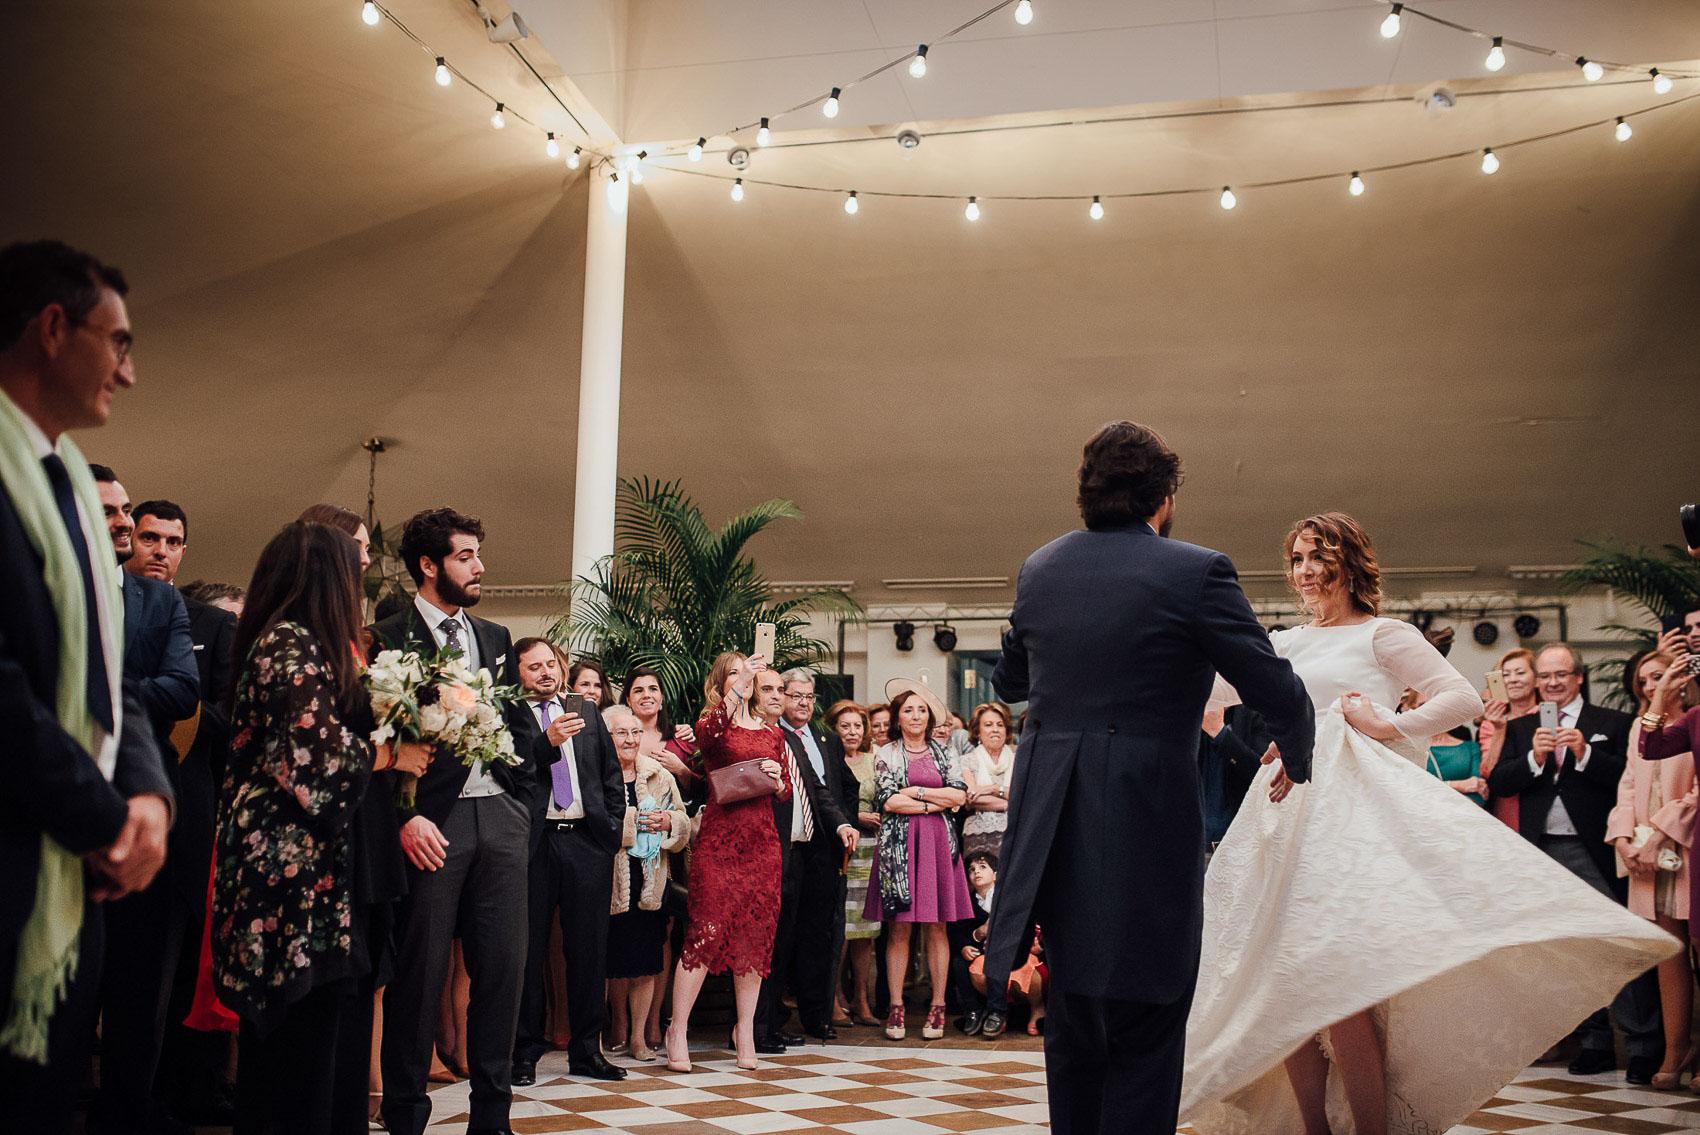 baile novios detalle invitados decoracion luces